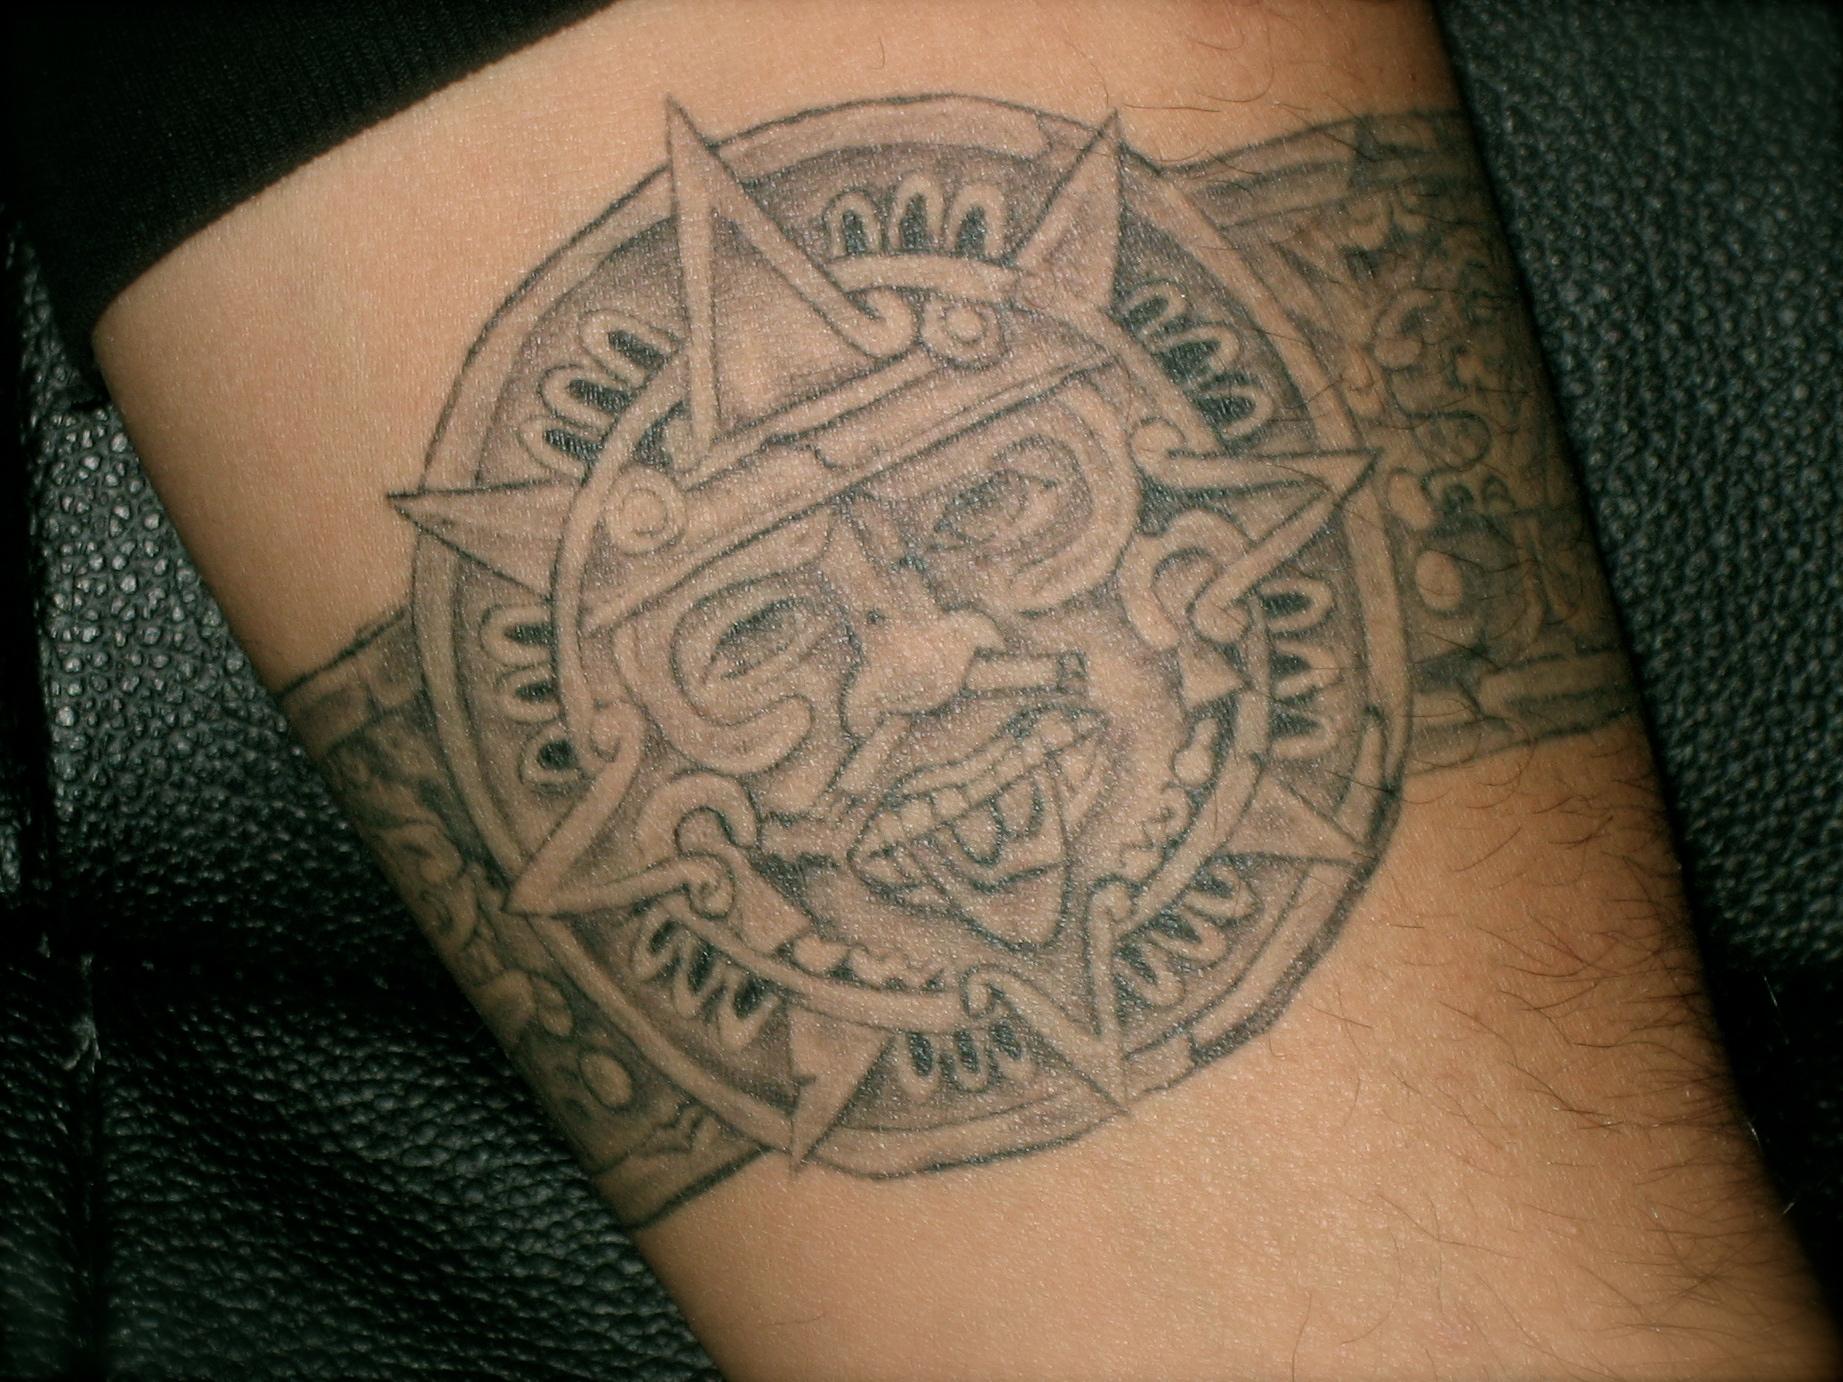 Aztec Temple Tattoo 55+ ancient mesoamerican aztec tattoo design ideas and